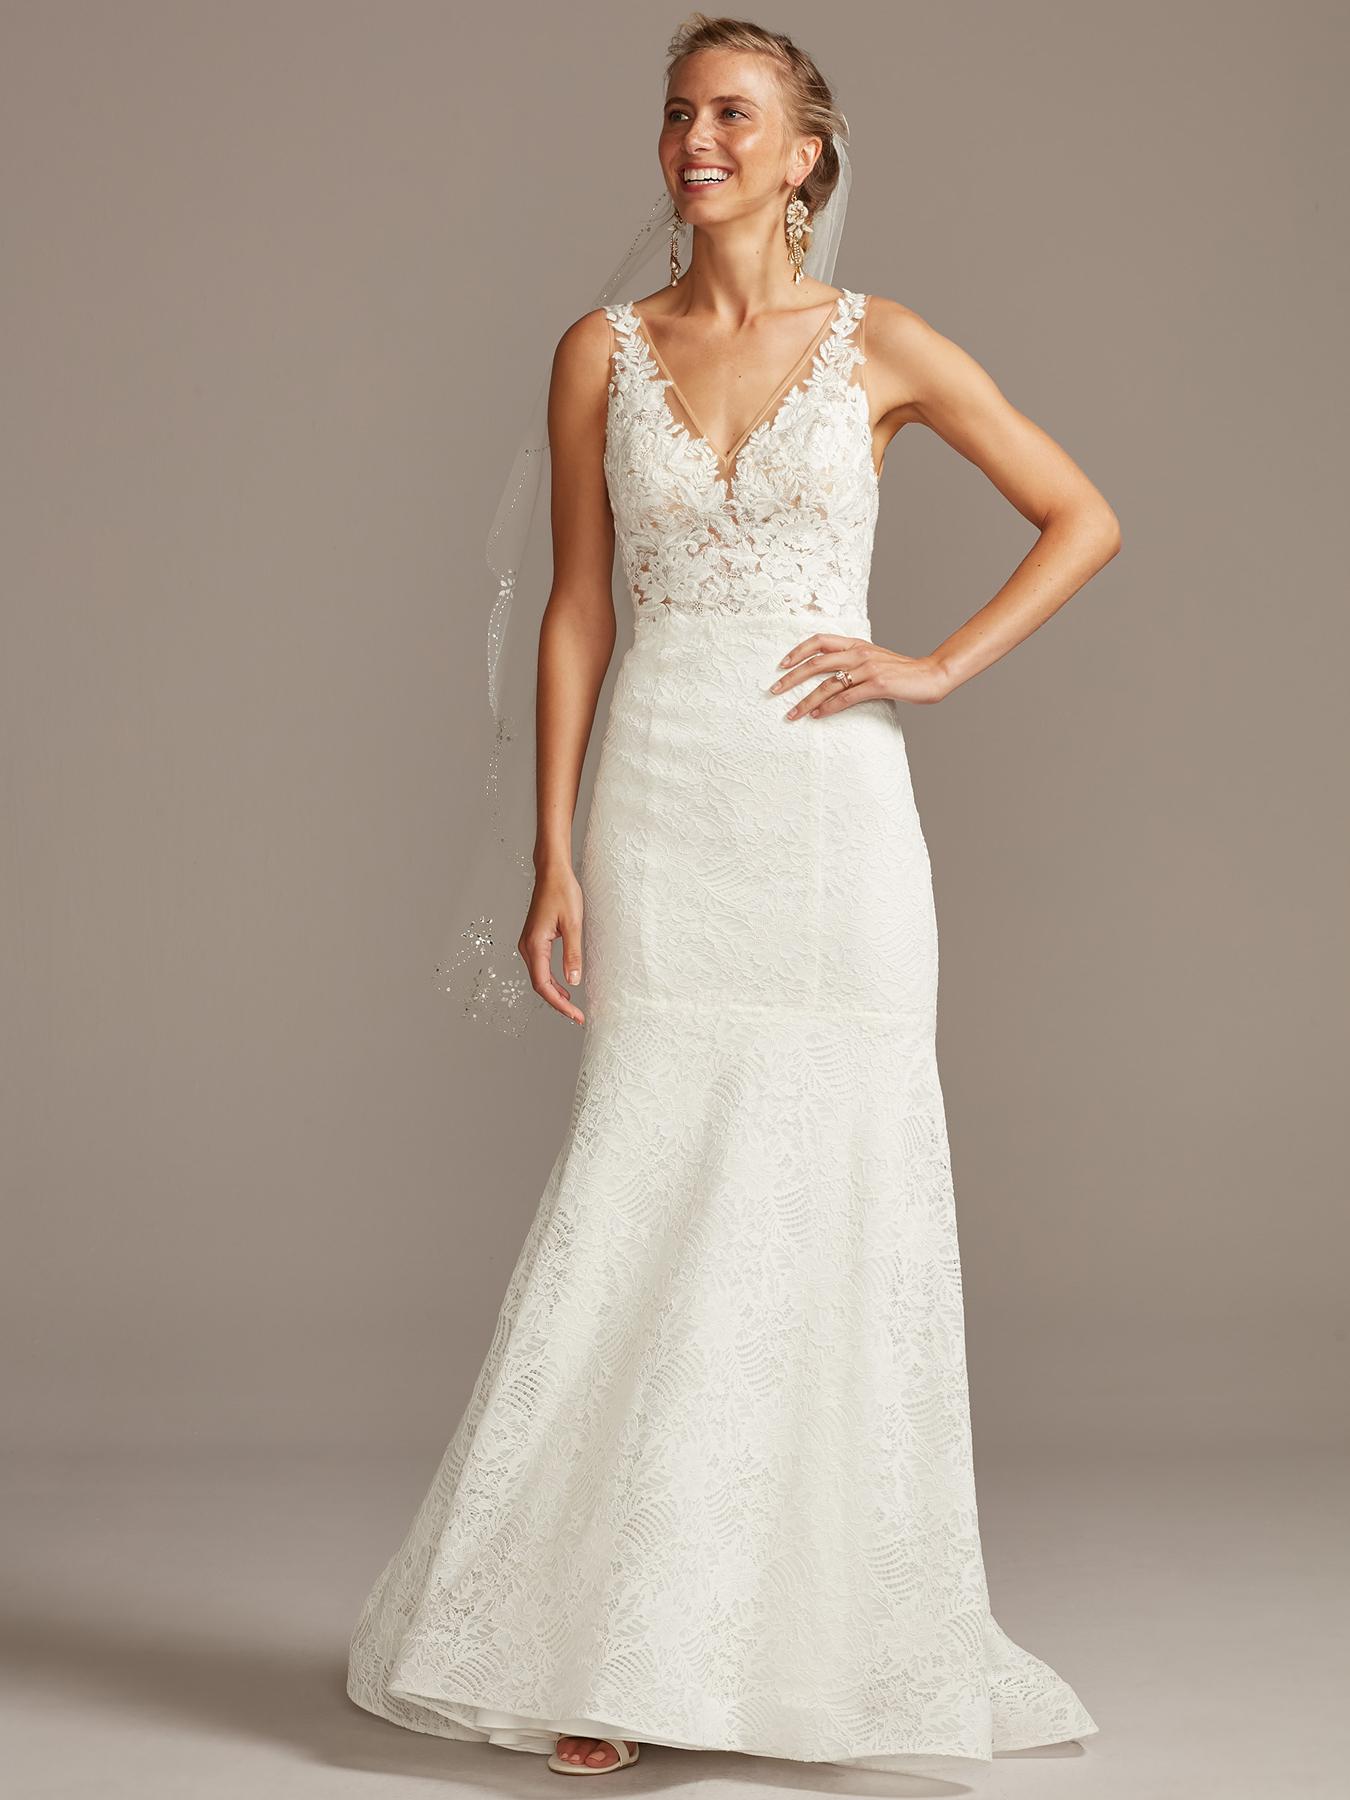 davids bridal melissa sweet v-neck lace trumpet wedding dress fall 2020